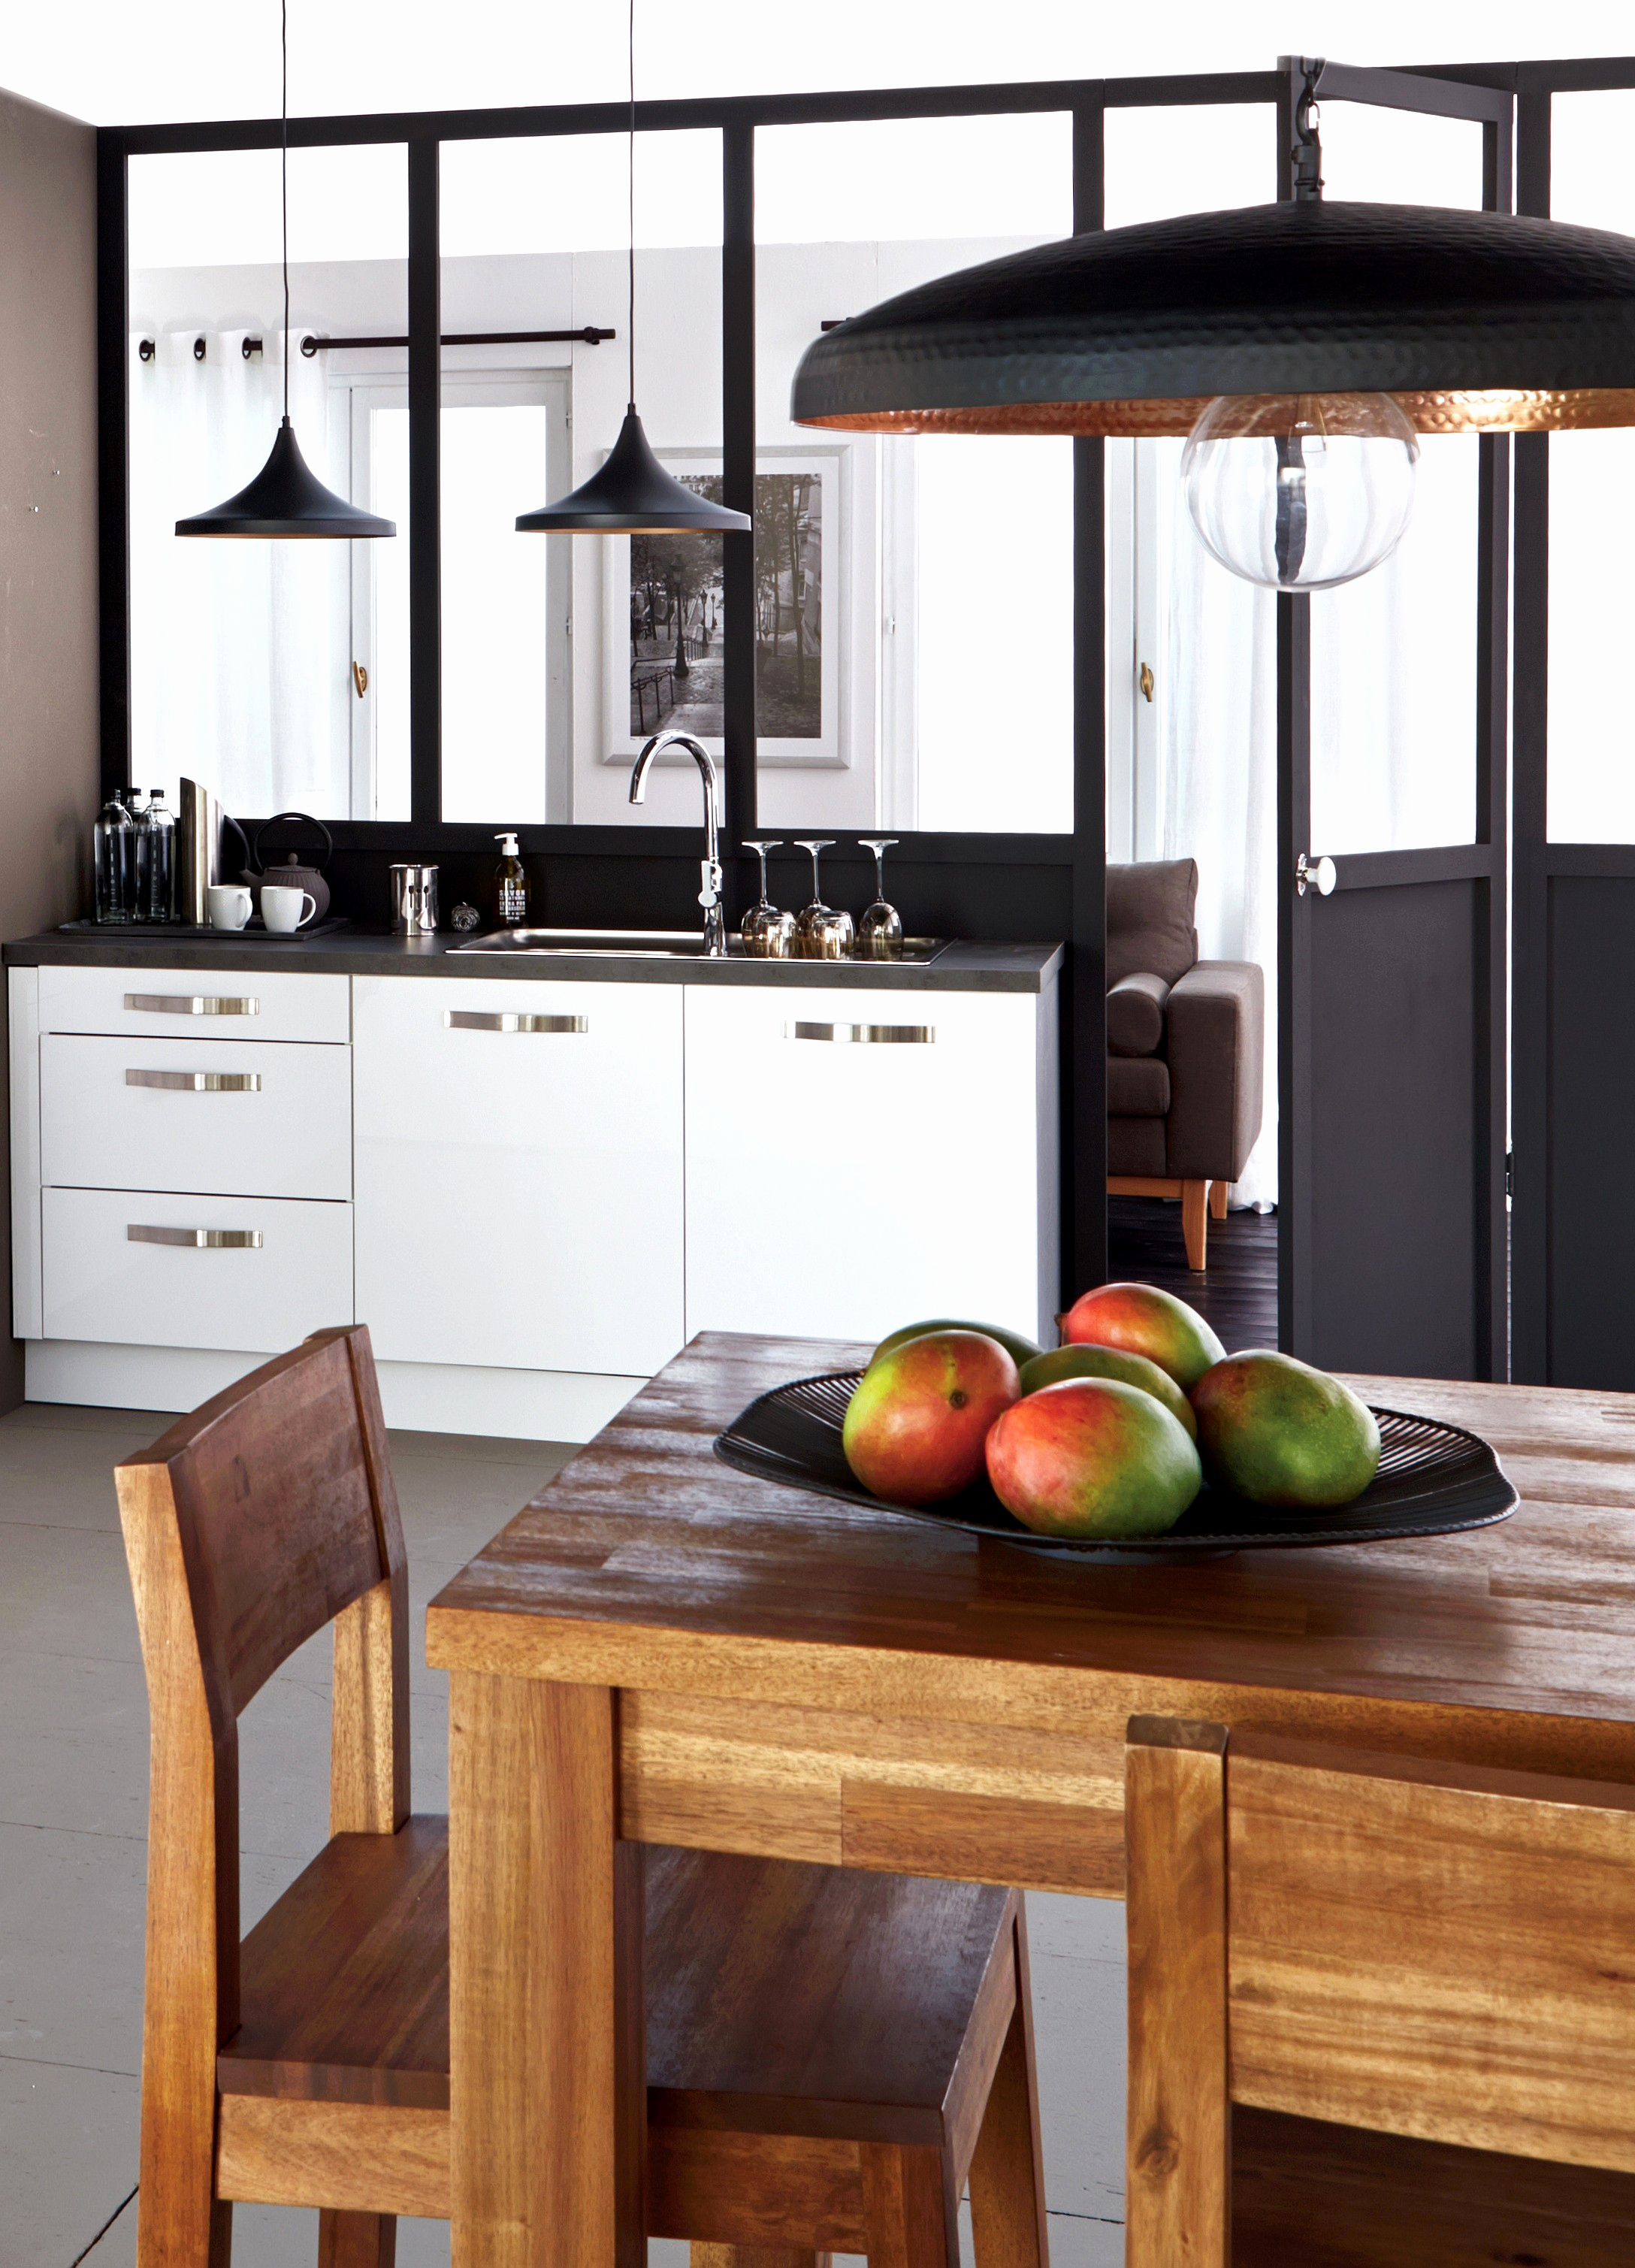 Cuisine Ikea Hittarp Impressionnant Collection Couleur Cuisine Ikea Best Ikea Chaise Cuisine Ikea Chaise Cuisine